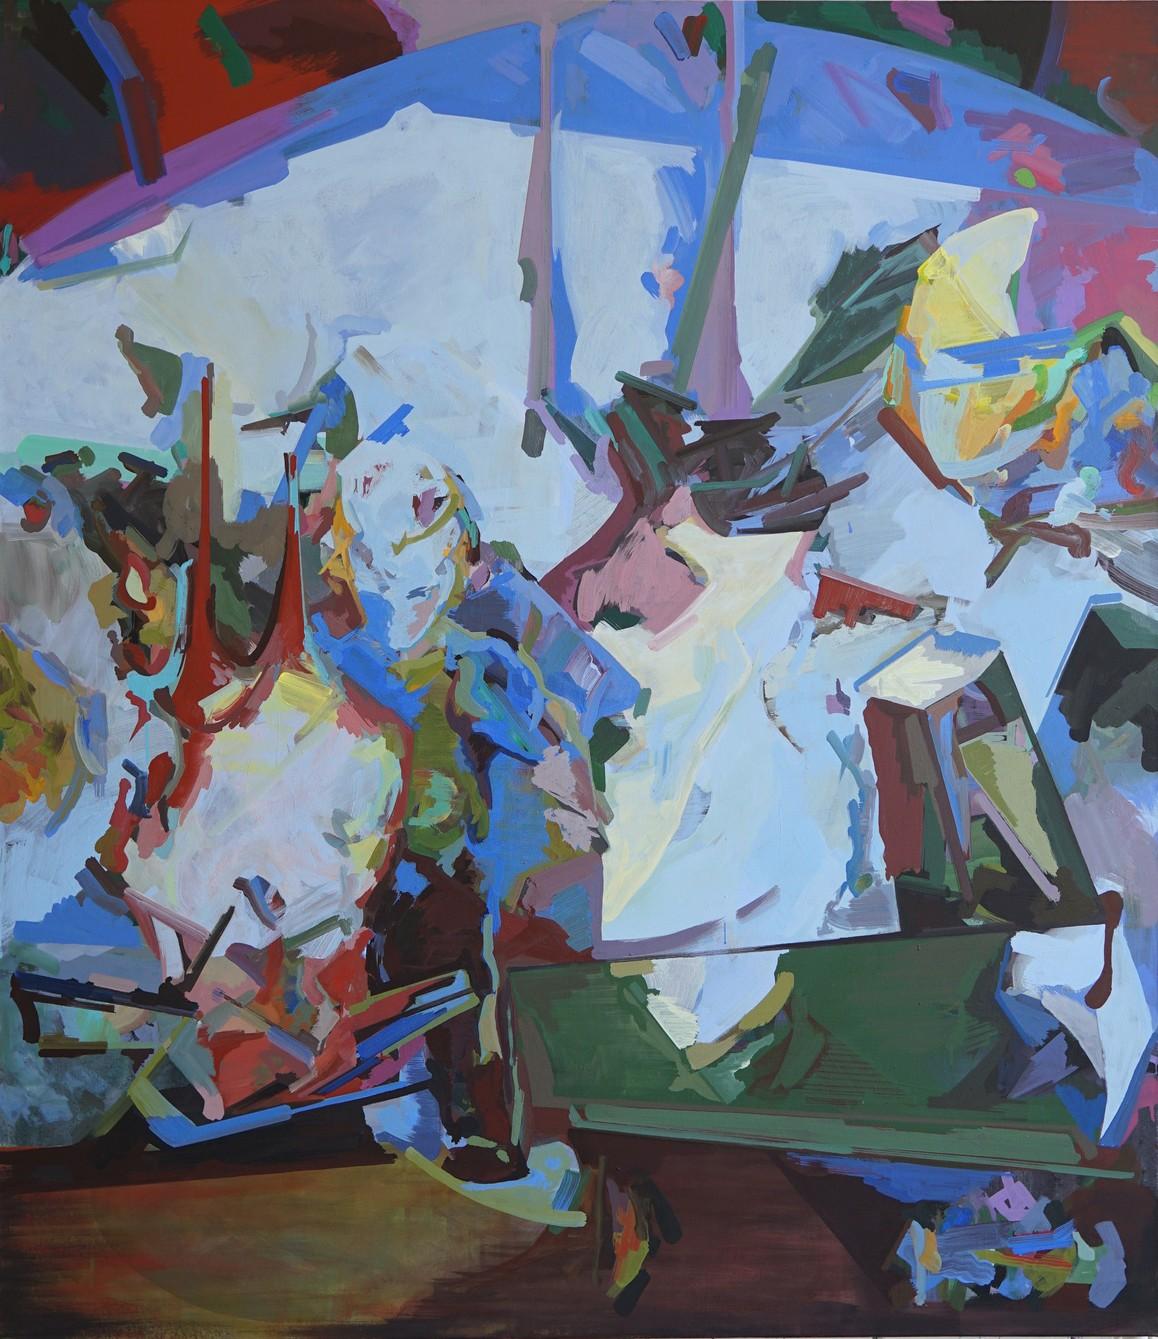 TIFFYLAND, 2019, Acryl auf Leinwand, 155 x 135 cm